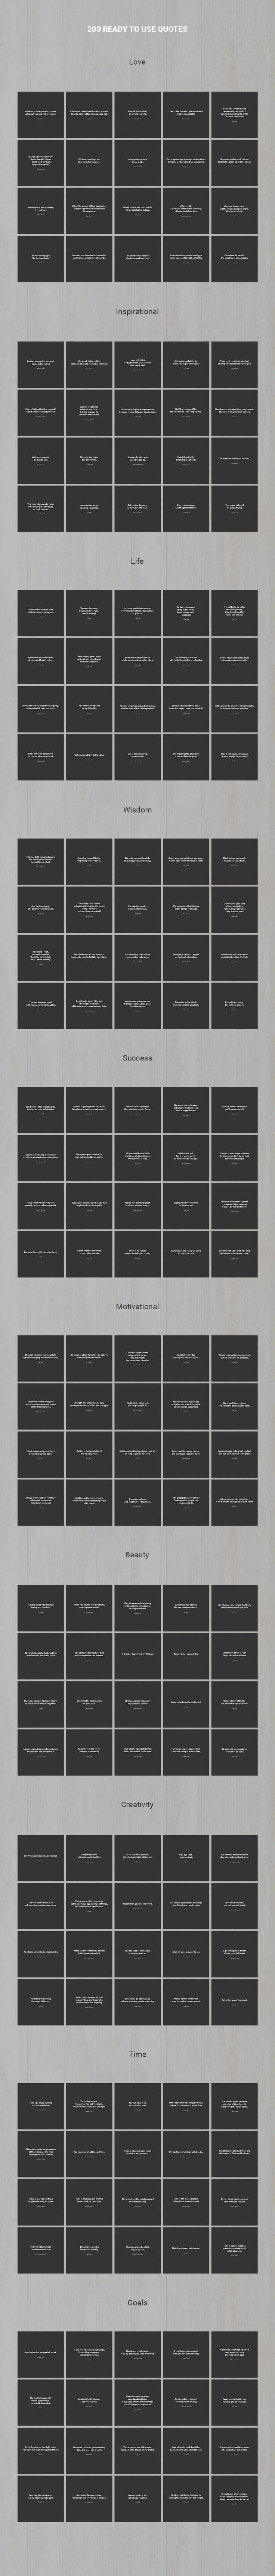 Social Media Quote Creator by Web Donut #quote #quotecreator #quotetemplates #instagramquotes #pinterestquotes #facebookquotes #twitterquotes #socialmedia #socialmediaquotes #webdonut #webelements #instagram #facebook #pinterest #twitter #graphicsbuilder #graphicscreator #banner #bannercreator #socialmediabanner #websitebanner #blogbanner #lovequotes #inspirationalquotes #lifequotes  #wisdomquotes #successsquotes #motivationalquotes #beautyquotes  #fashionquotes #creativityquotes…